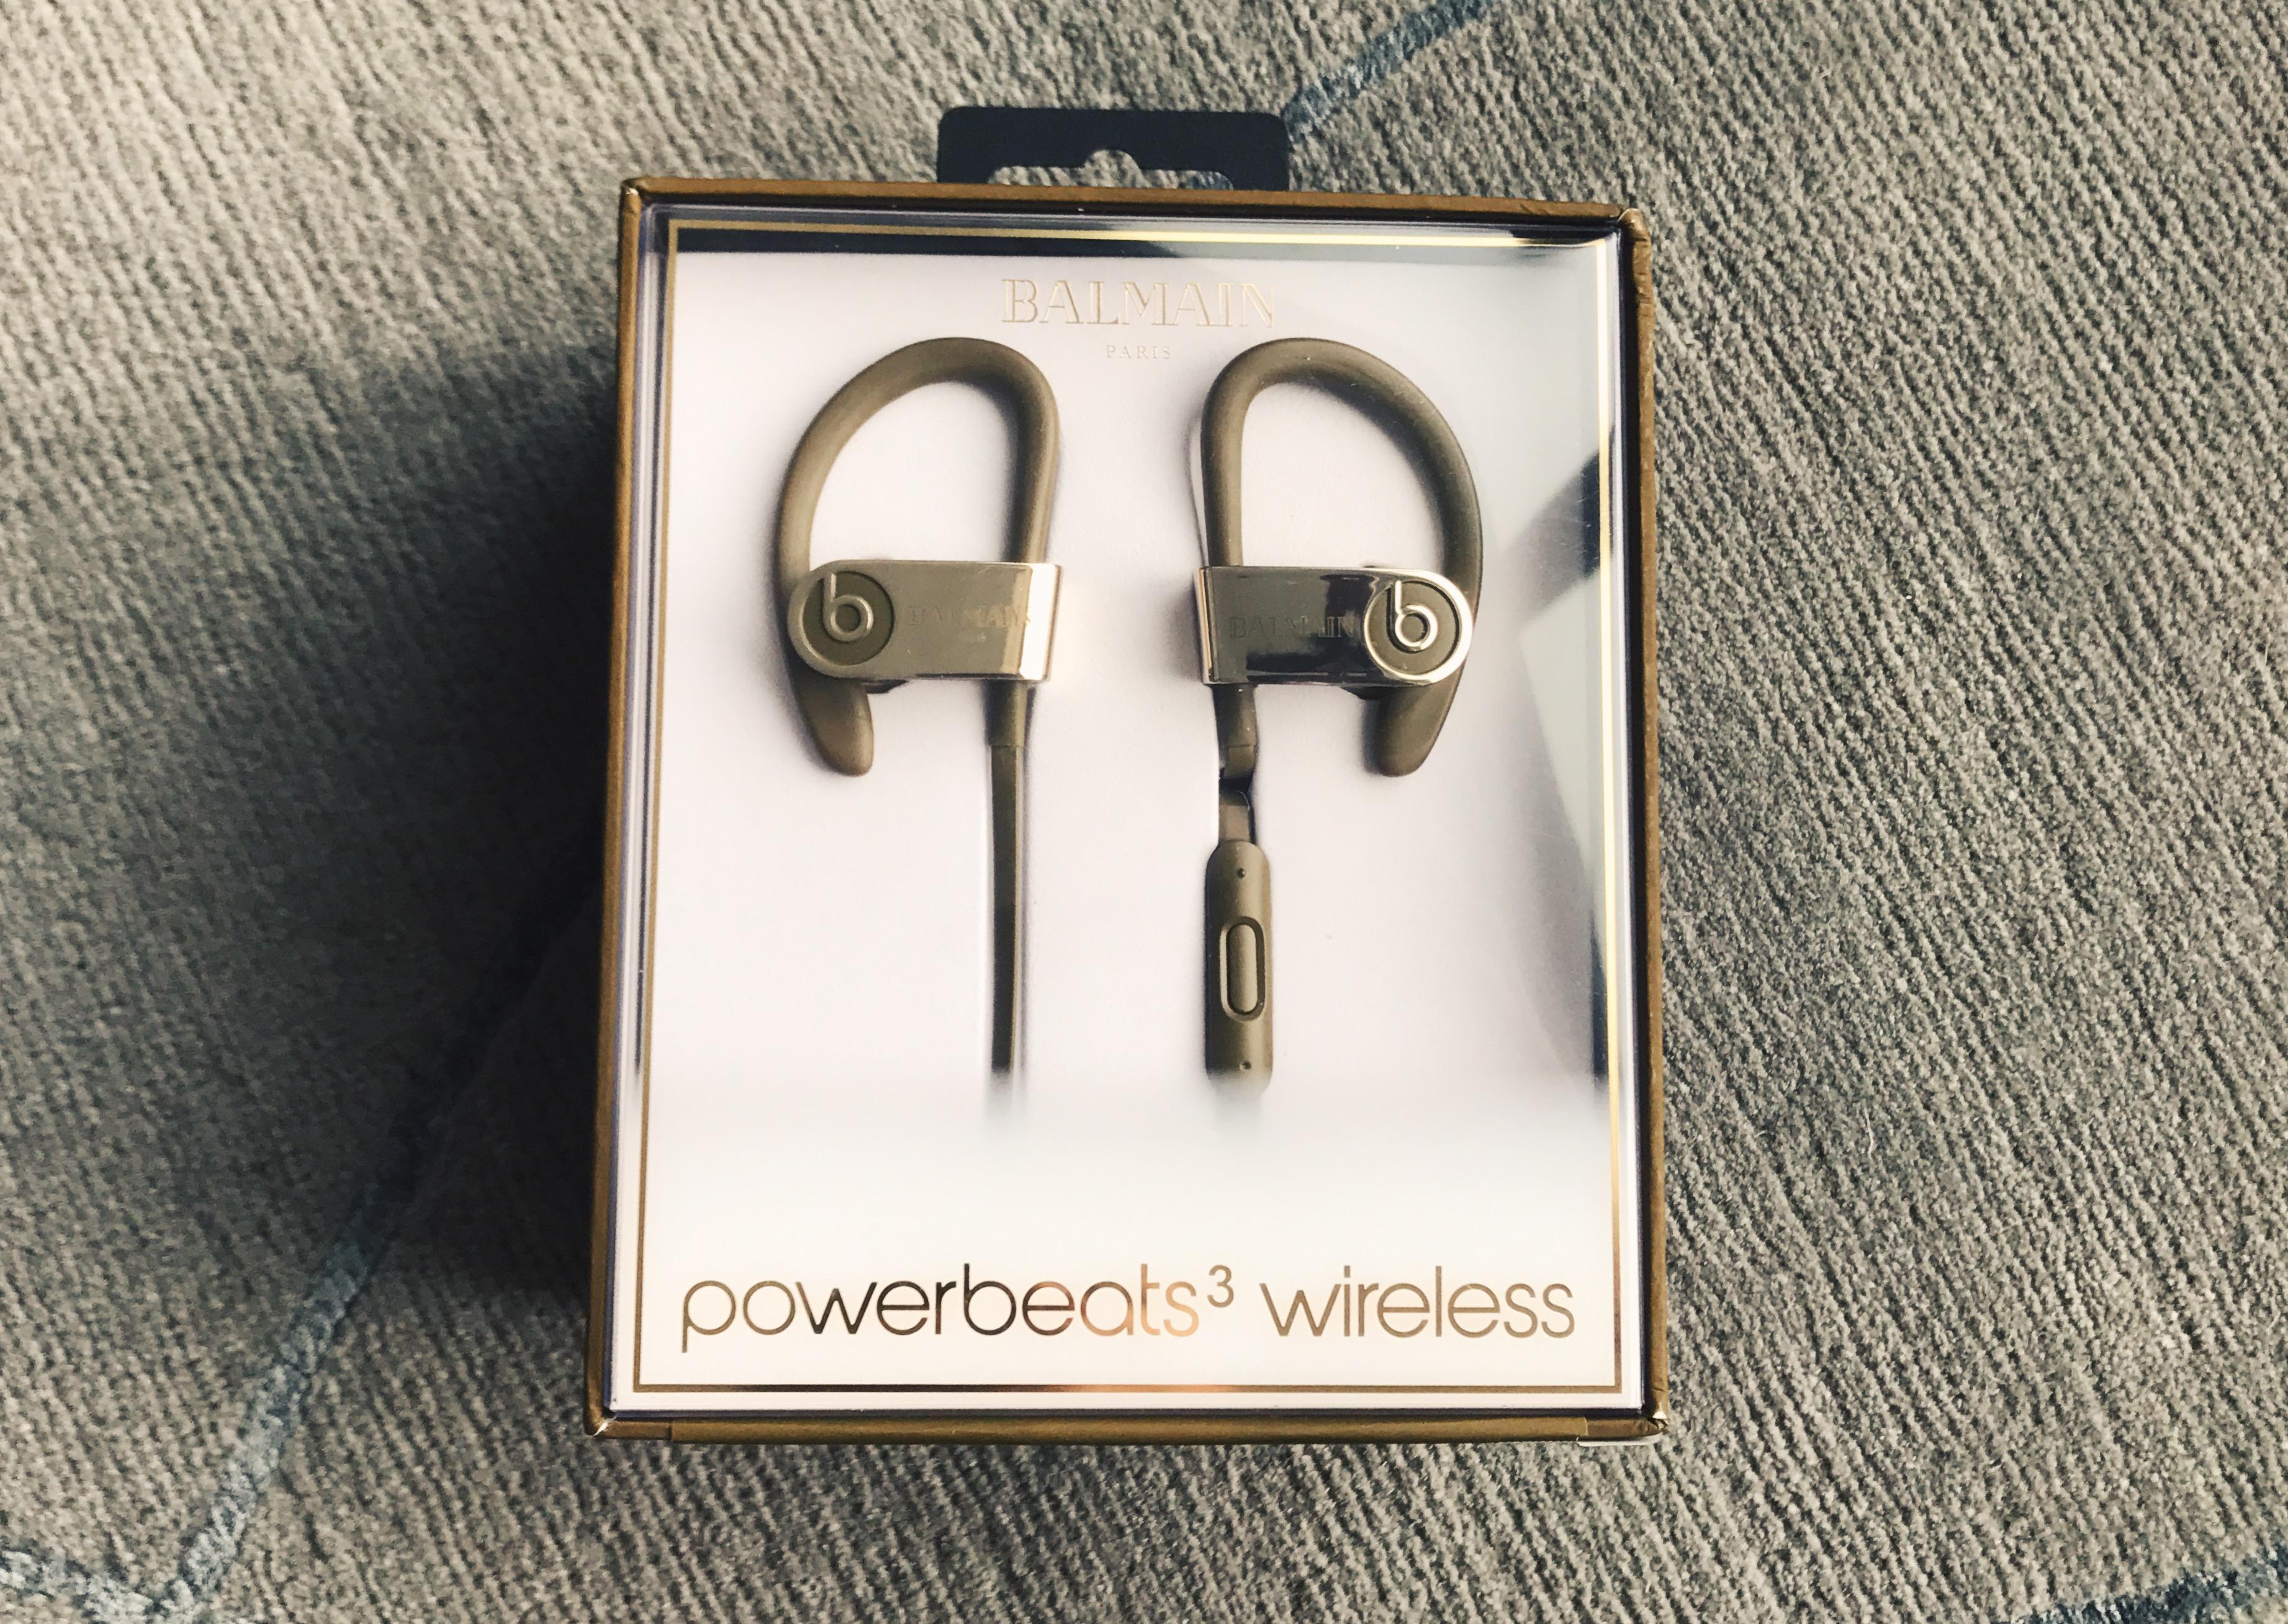 8fa3445ef12 Balmain Balmain X Beats Powerbeats 3 Wireless Headphones   Grailed